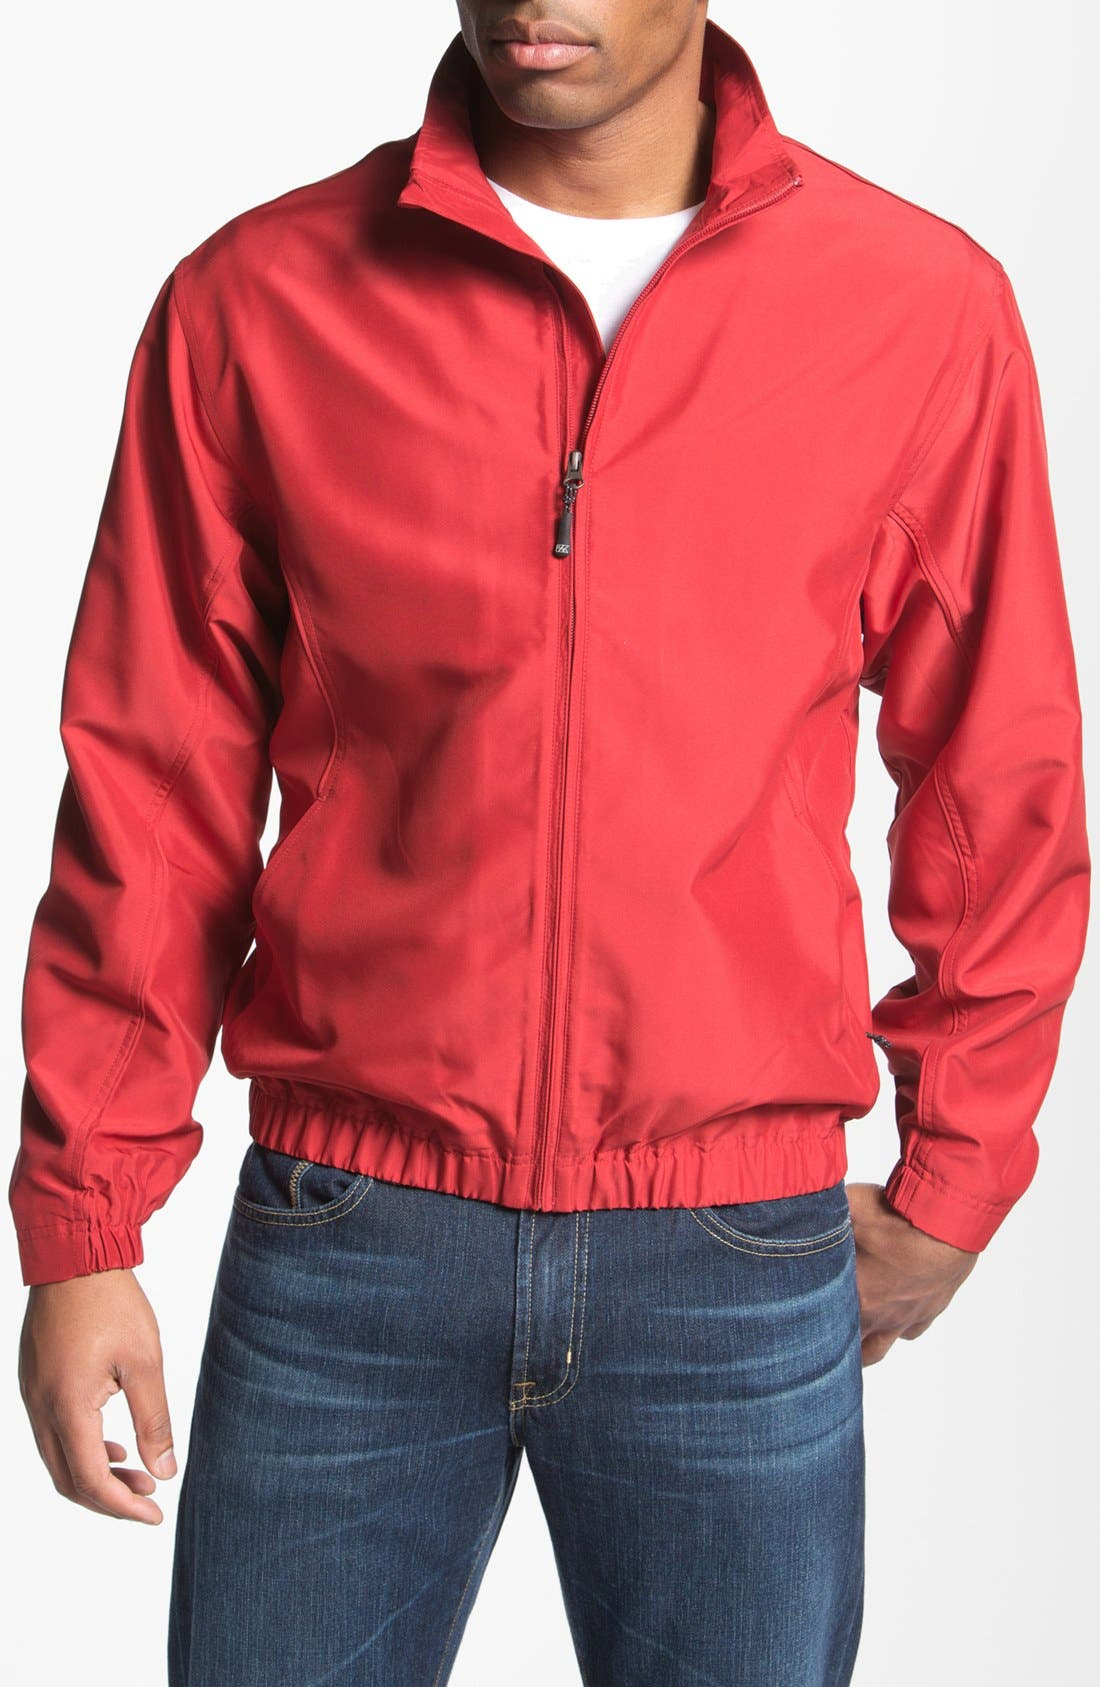 Main Image - Cutter & Buck 'Astute' Windbreaker Jacket (Big & Tall)